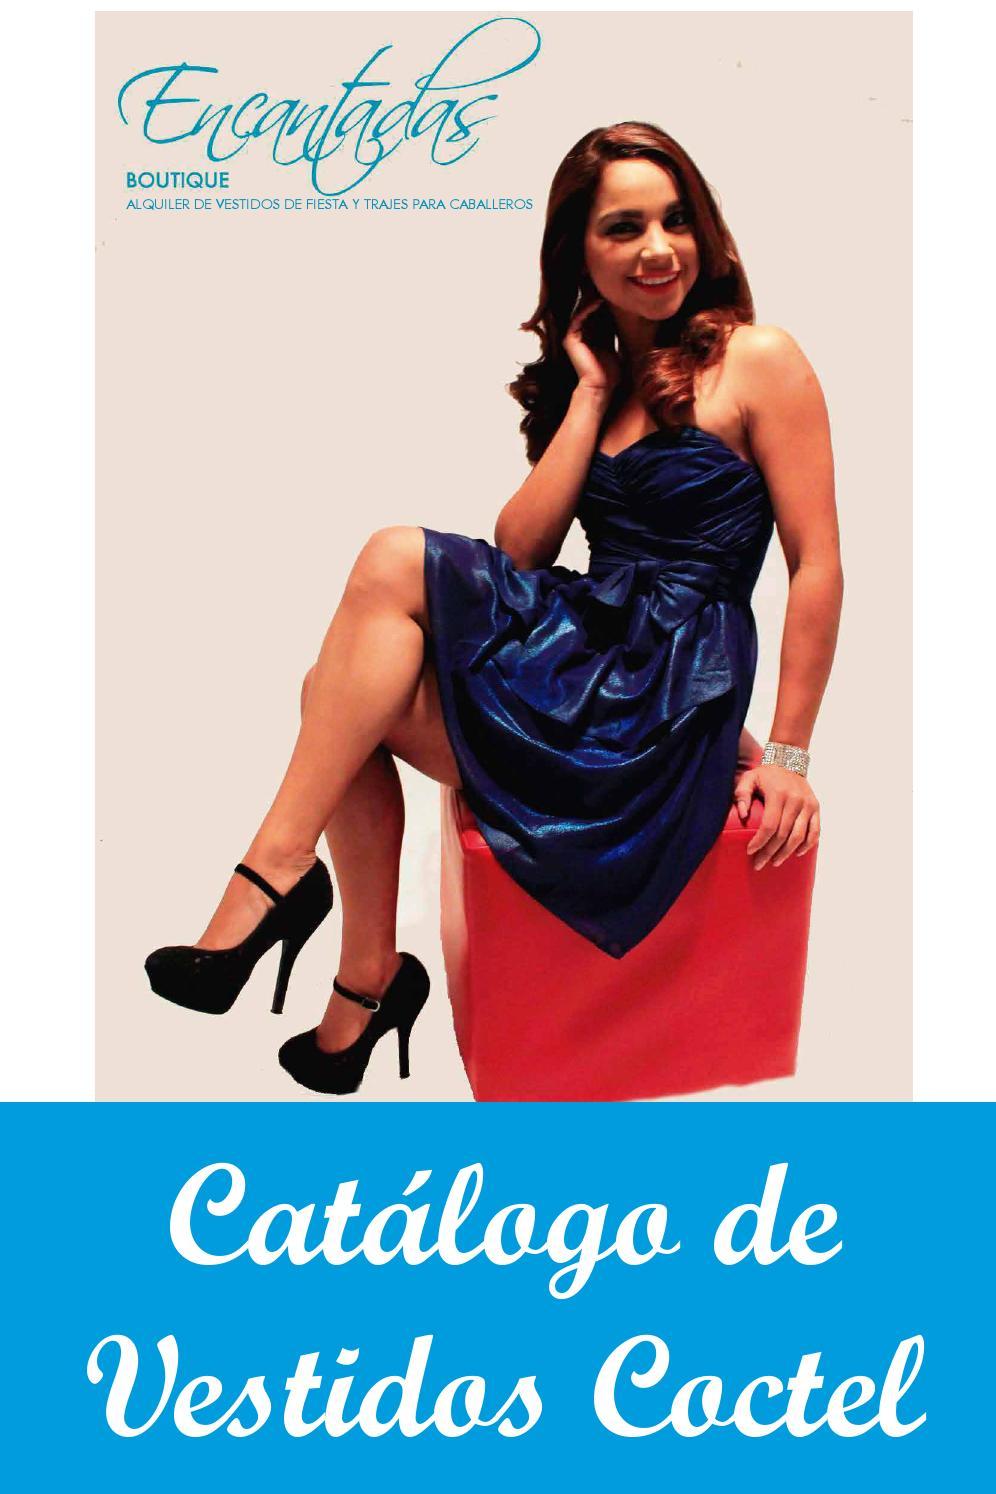 Catálogo Vestidos Cóctel Encantadas Boutique By